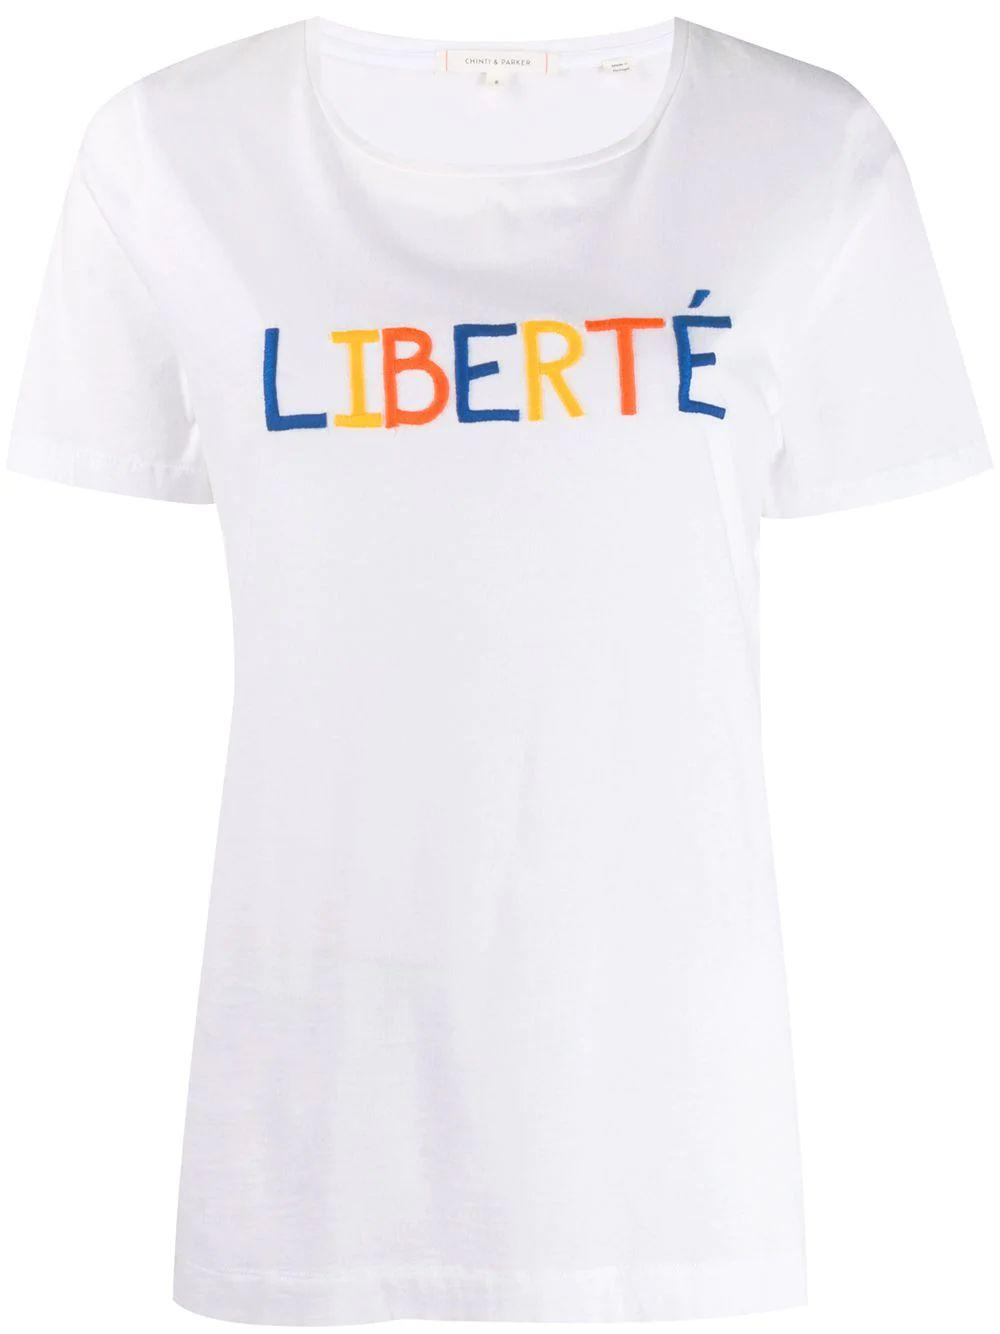 Liberte Short Sleeve Tshirt